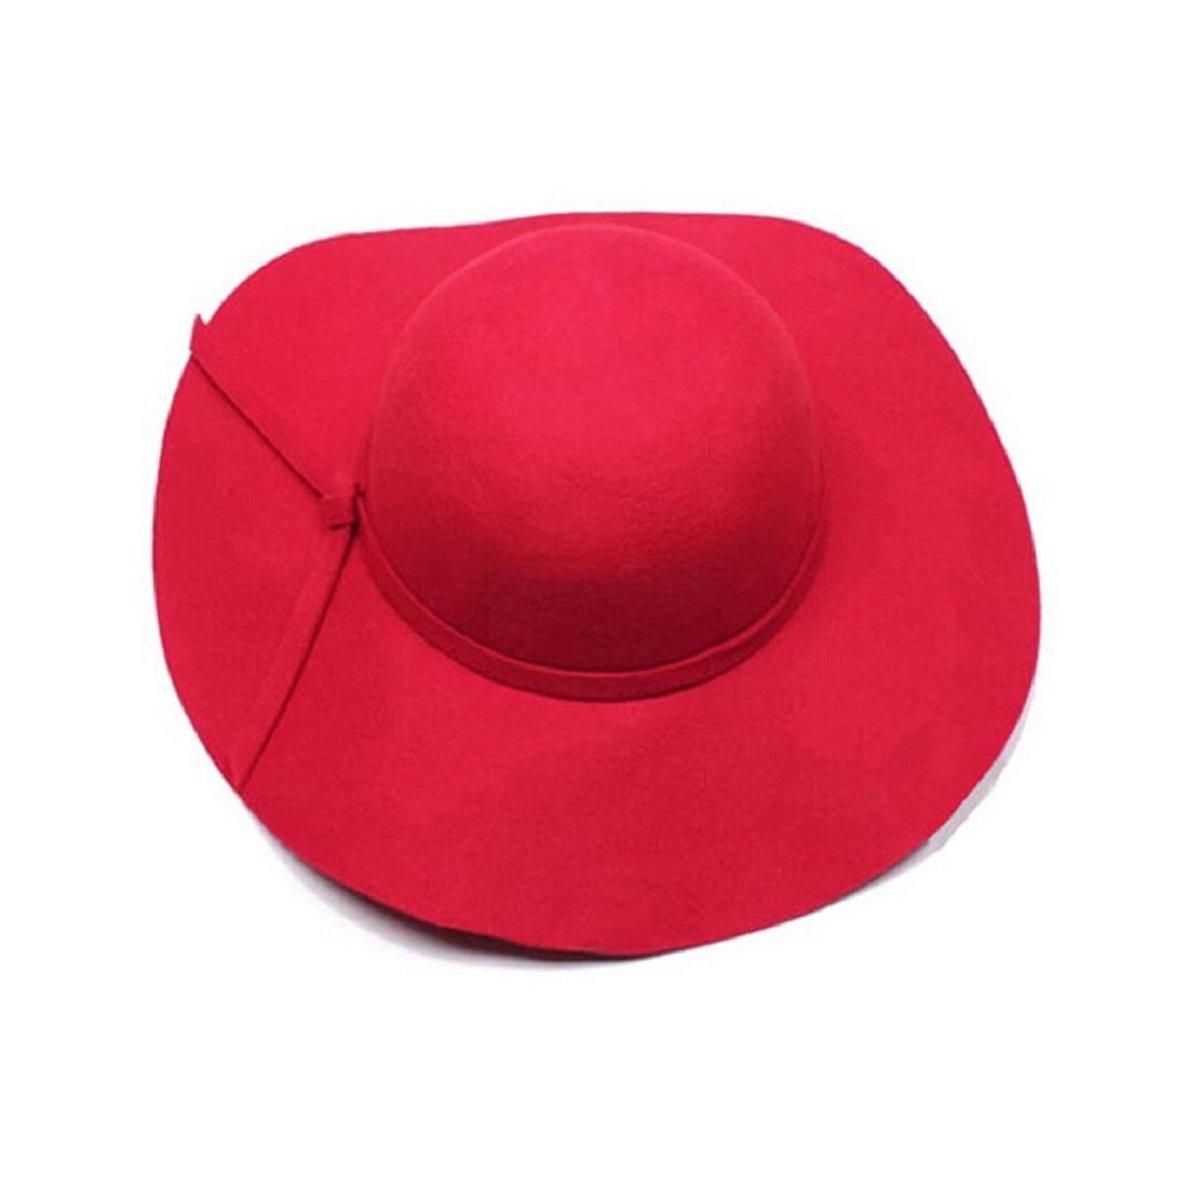 Doinshop Women Girls Lovely Wool Wide Brim Felt Bowler Fedora Hat Lady Floppy Cloche